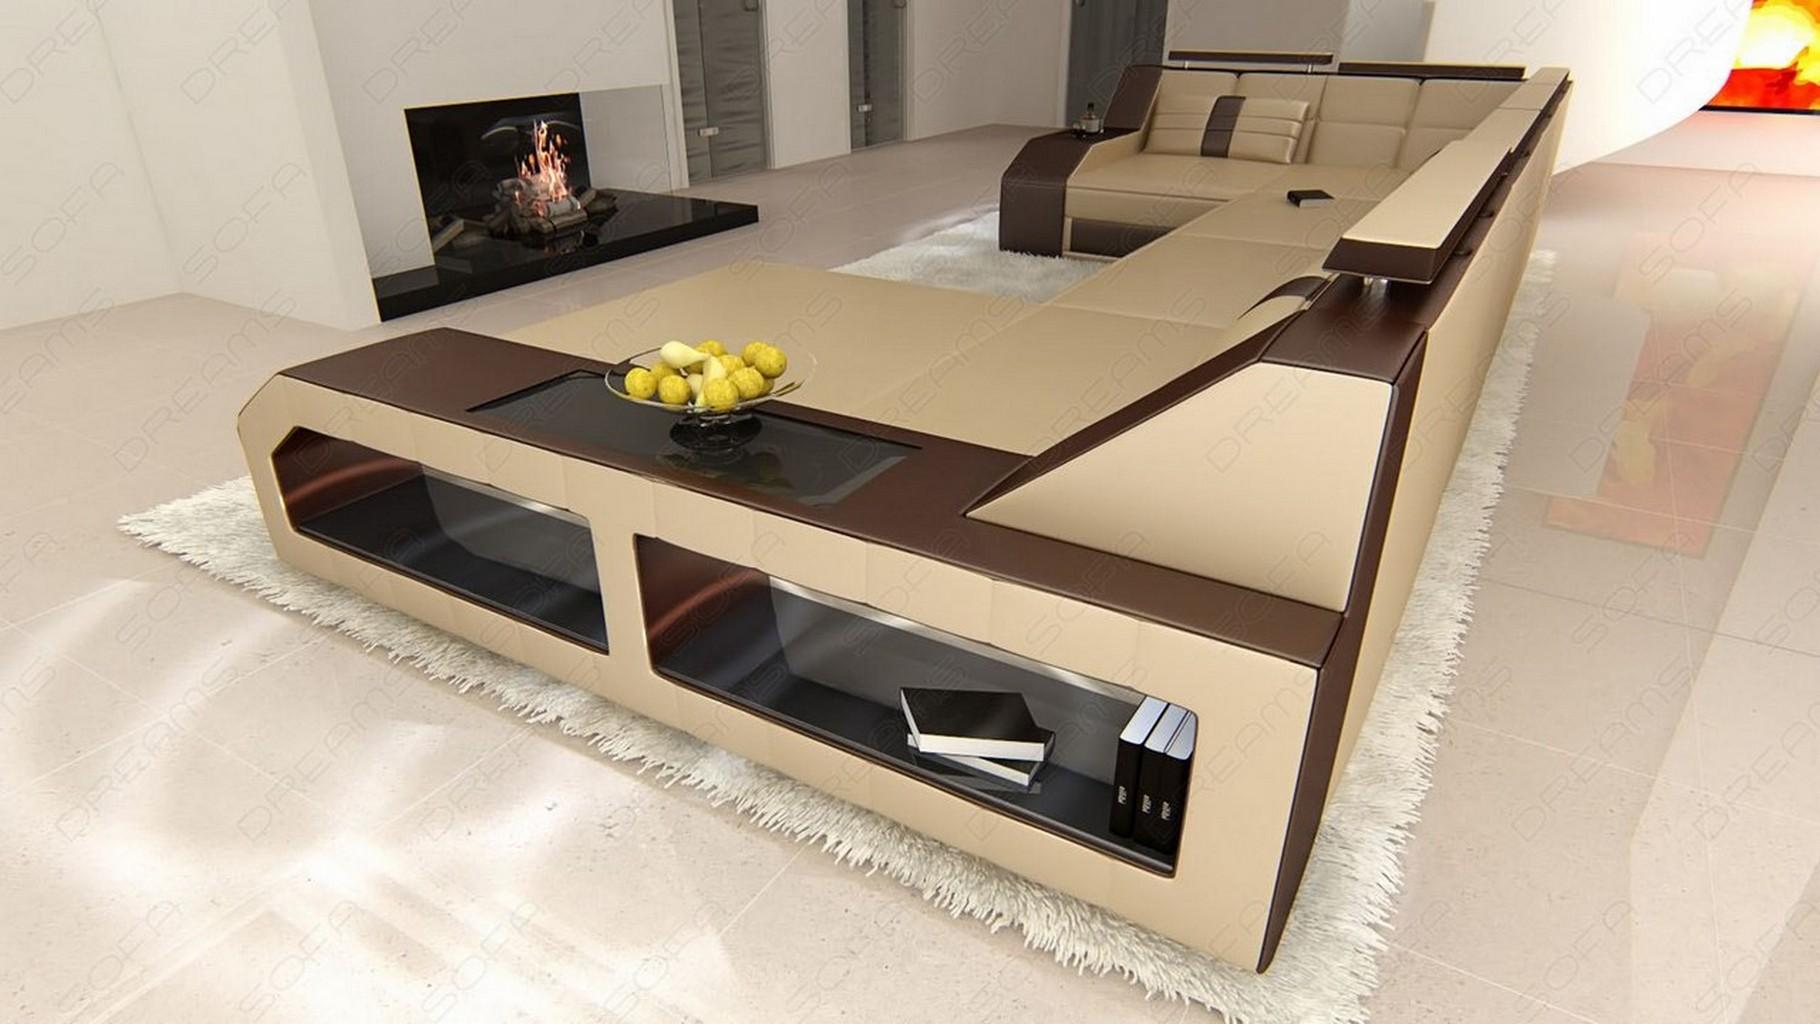 design sectional sofa arezzo led sandbeige darkbrown ebay. Black Bedroom Furniture Sets. Home Design Ideas